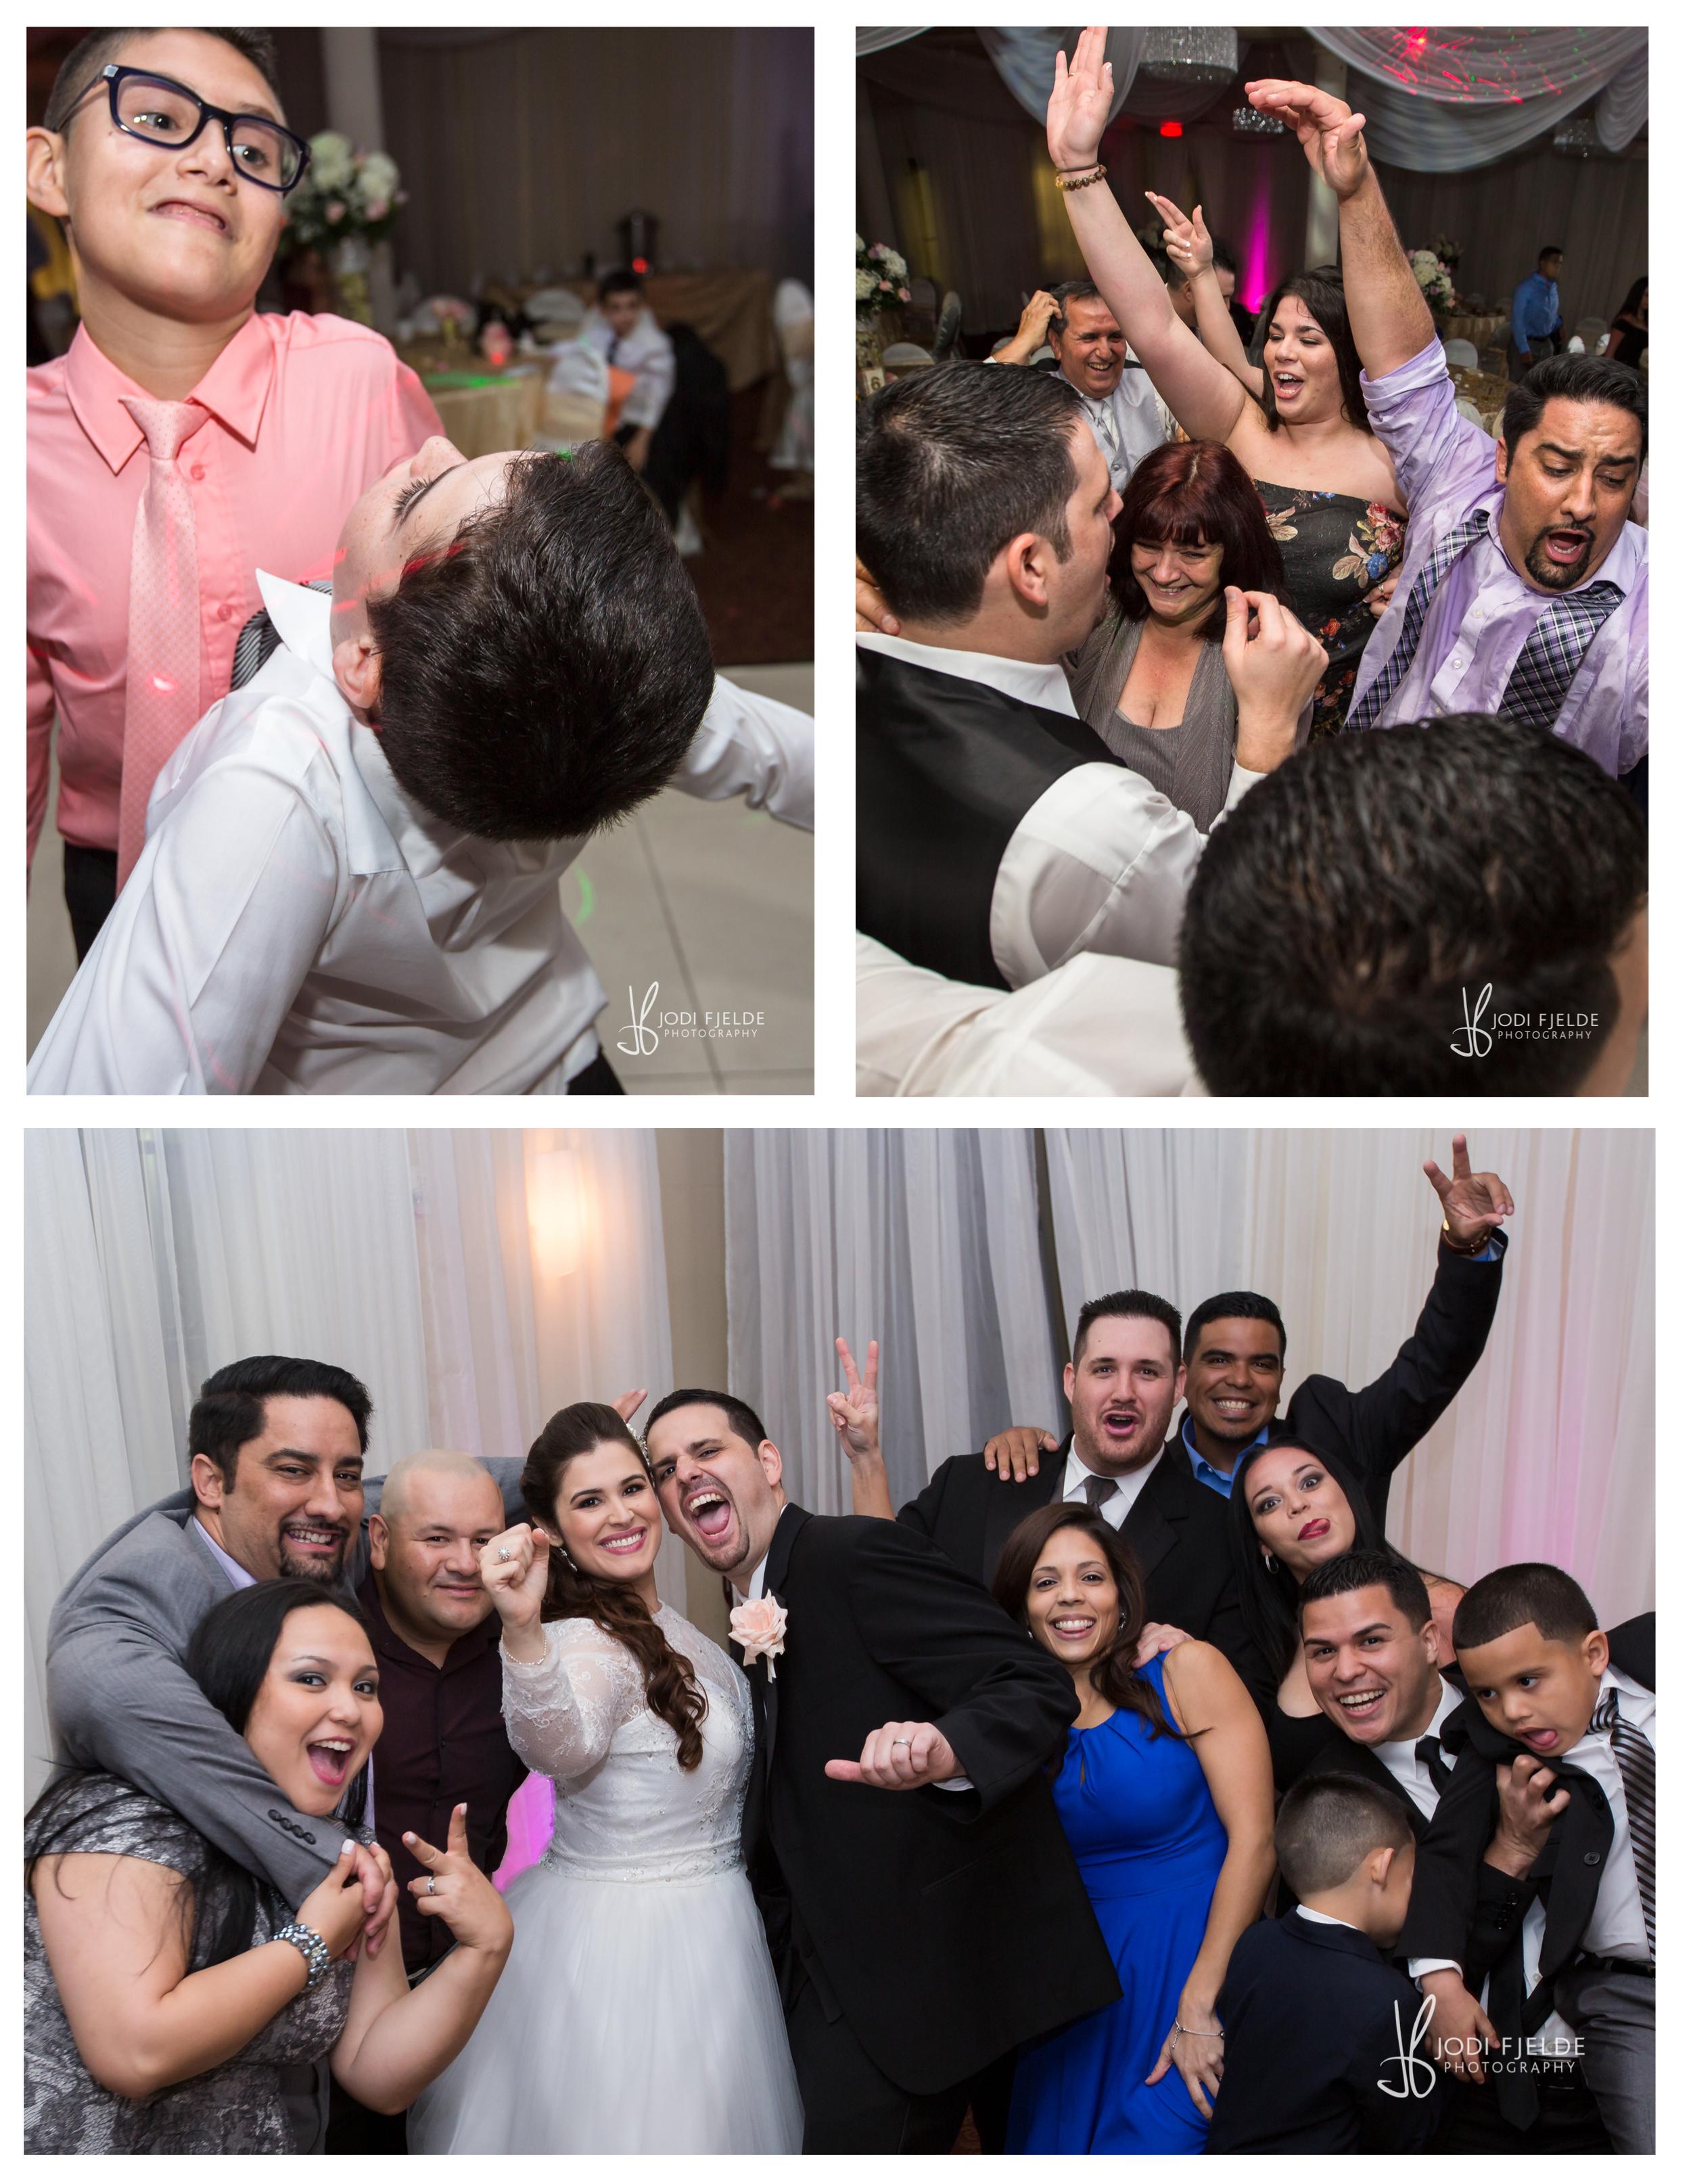 Ballroom Wedding_Ft Lauderdale_Florida_wedding_Maria_&_Juan_photography_jodi_Fjelde_photography-22.jpg